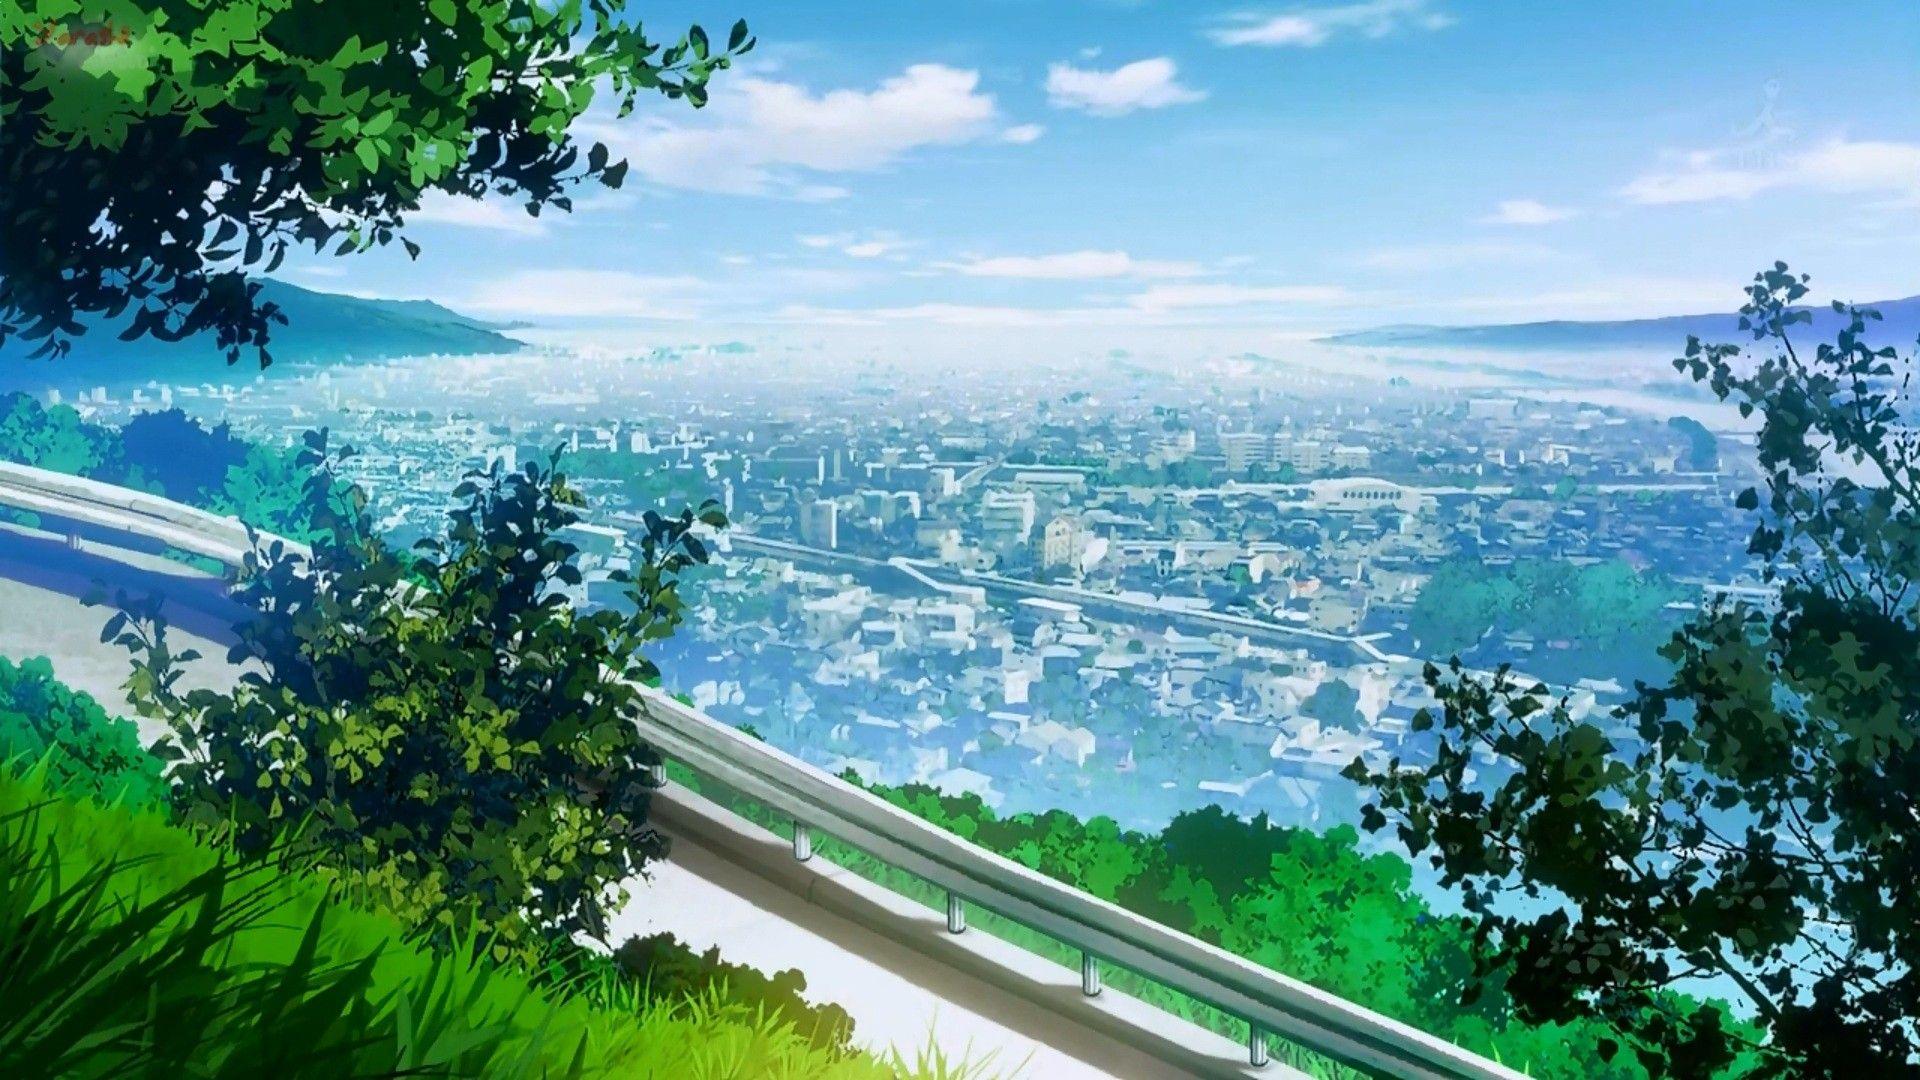 Cityscape Landscape City Anime Wallpaper Anime Scenery Wallpaper Scenery Wallpaper Anime Scenery